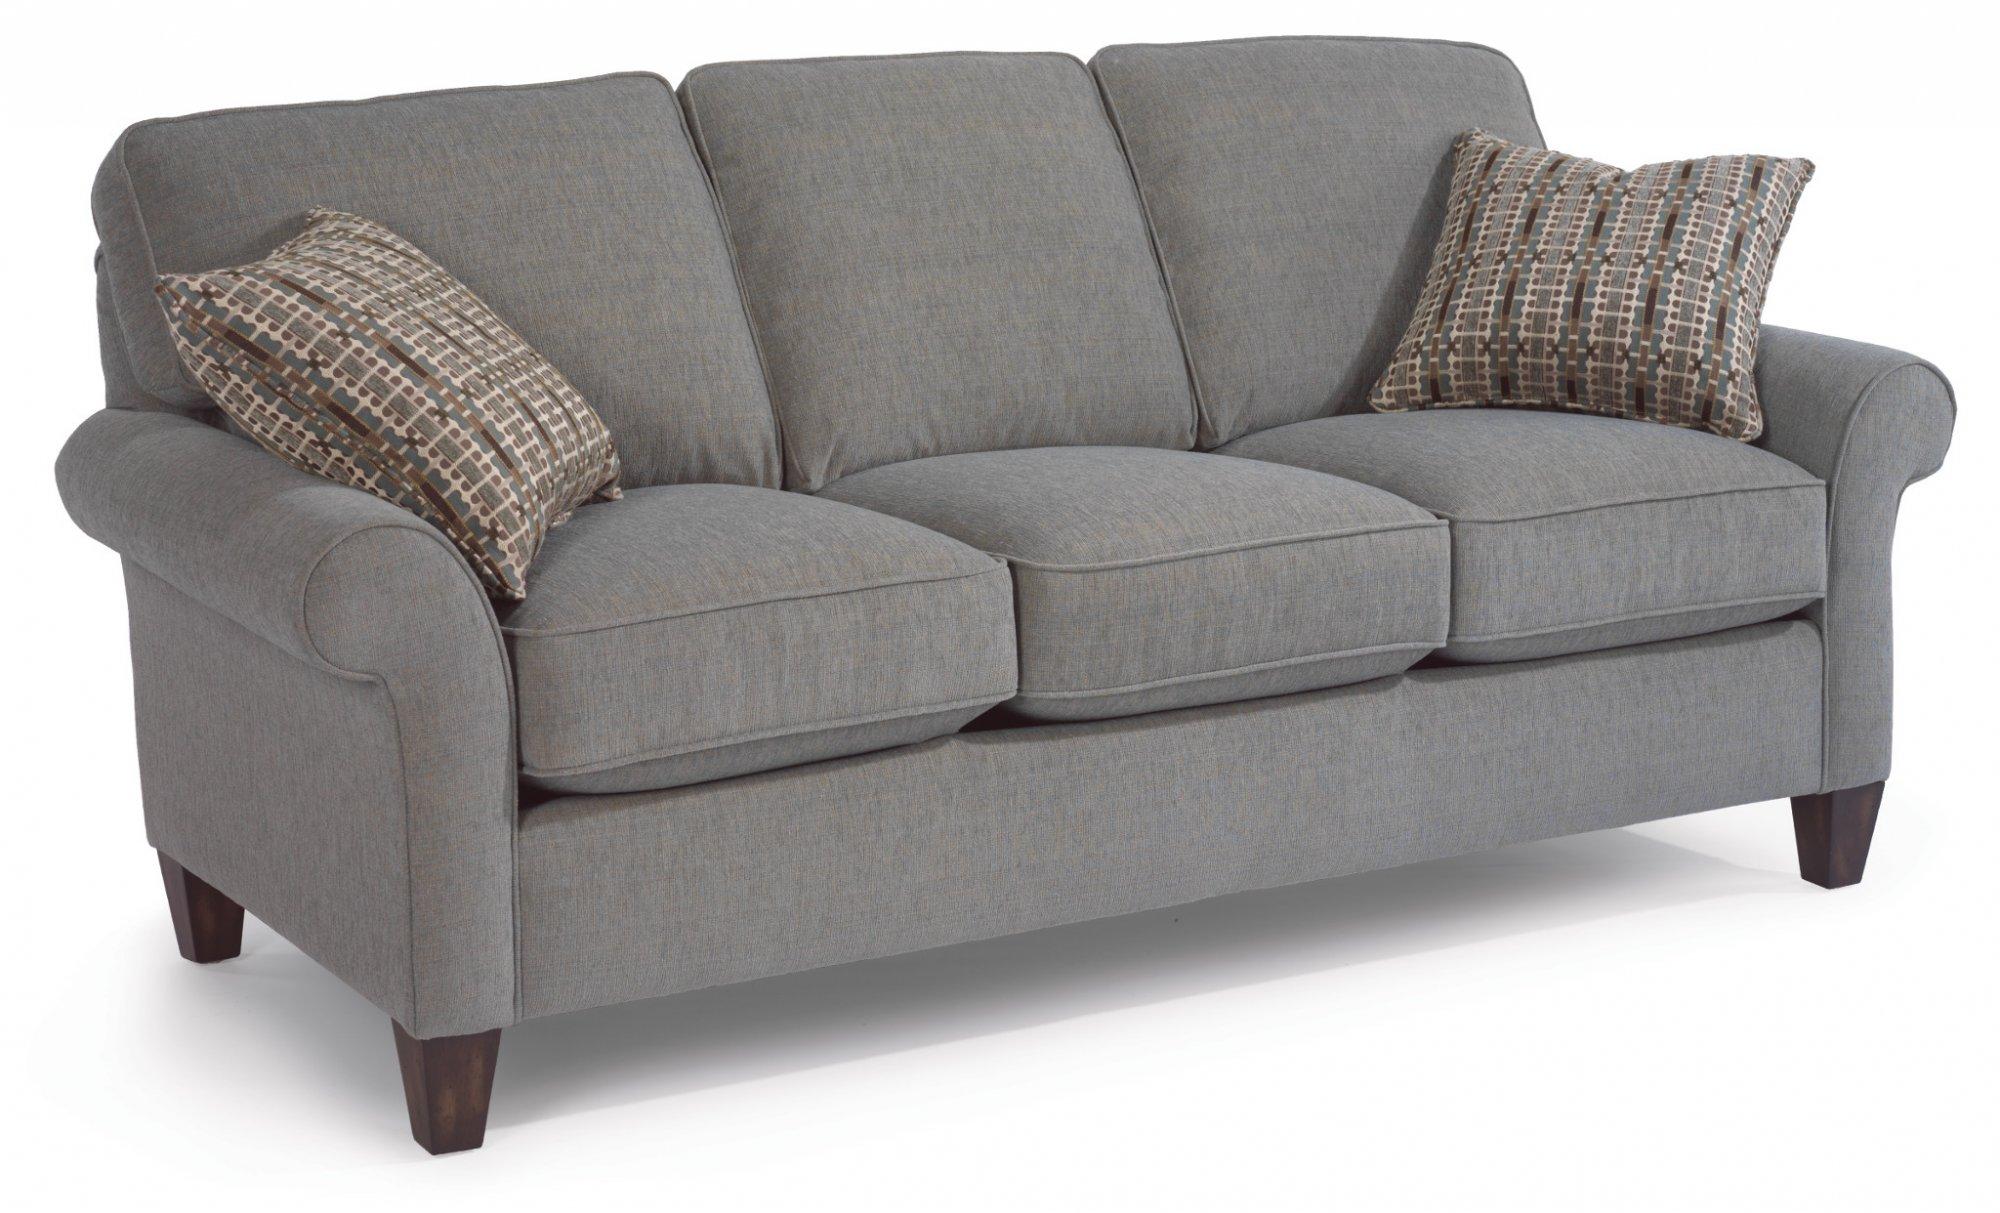 flexsteel sofa share via email download a high-resolution image IEXBASG